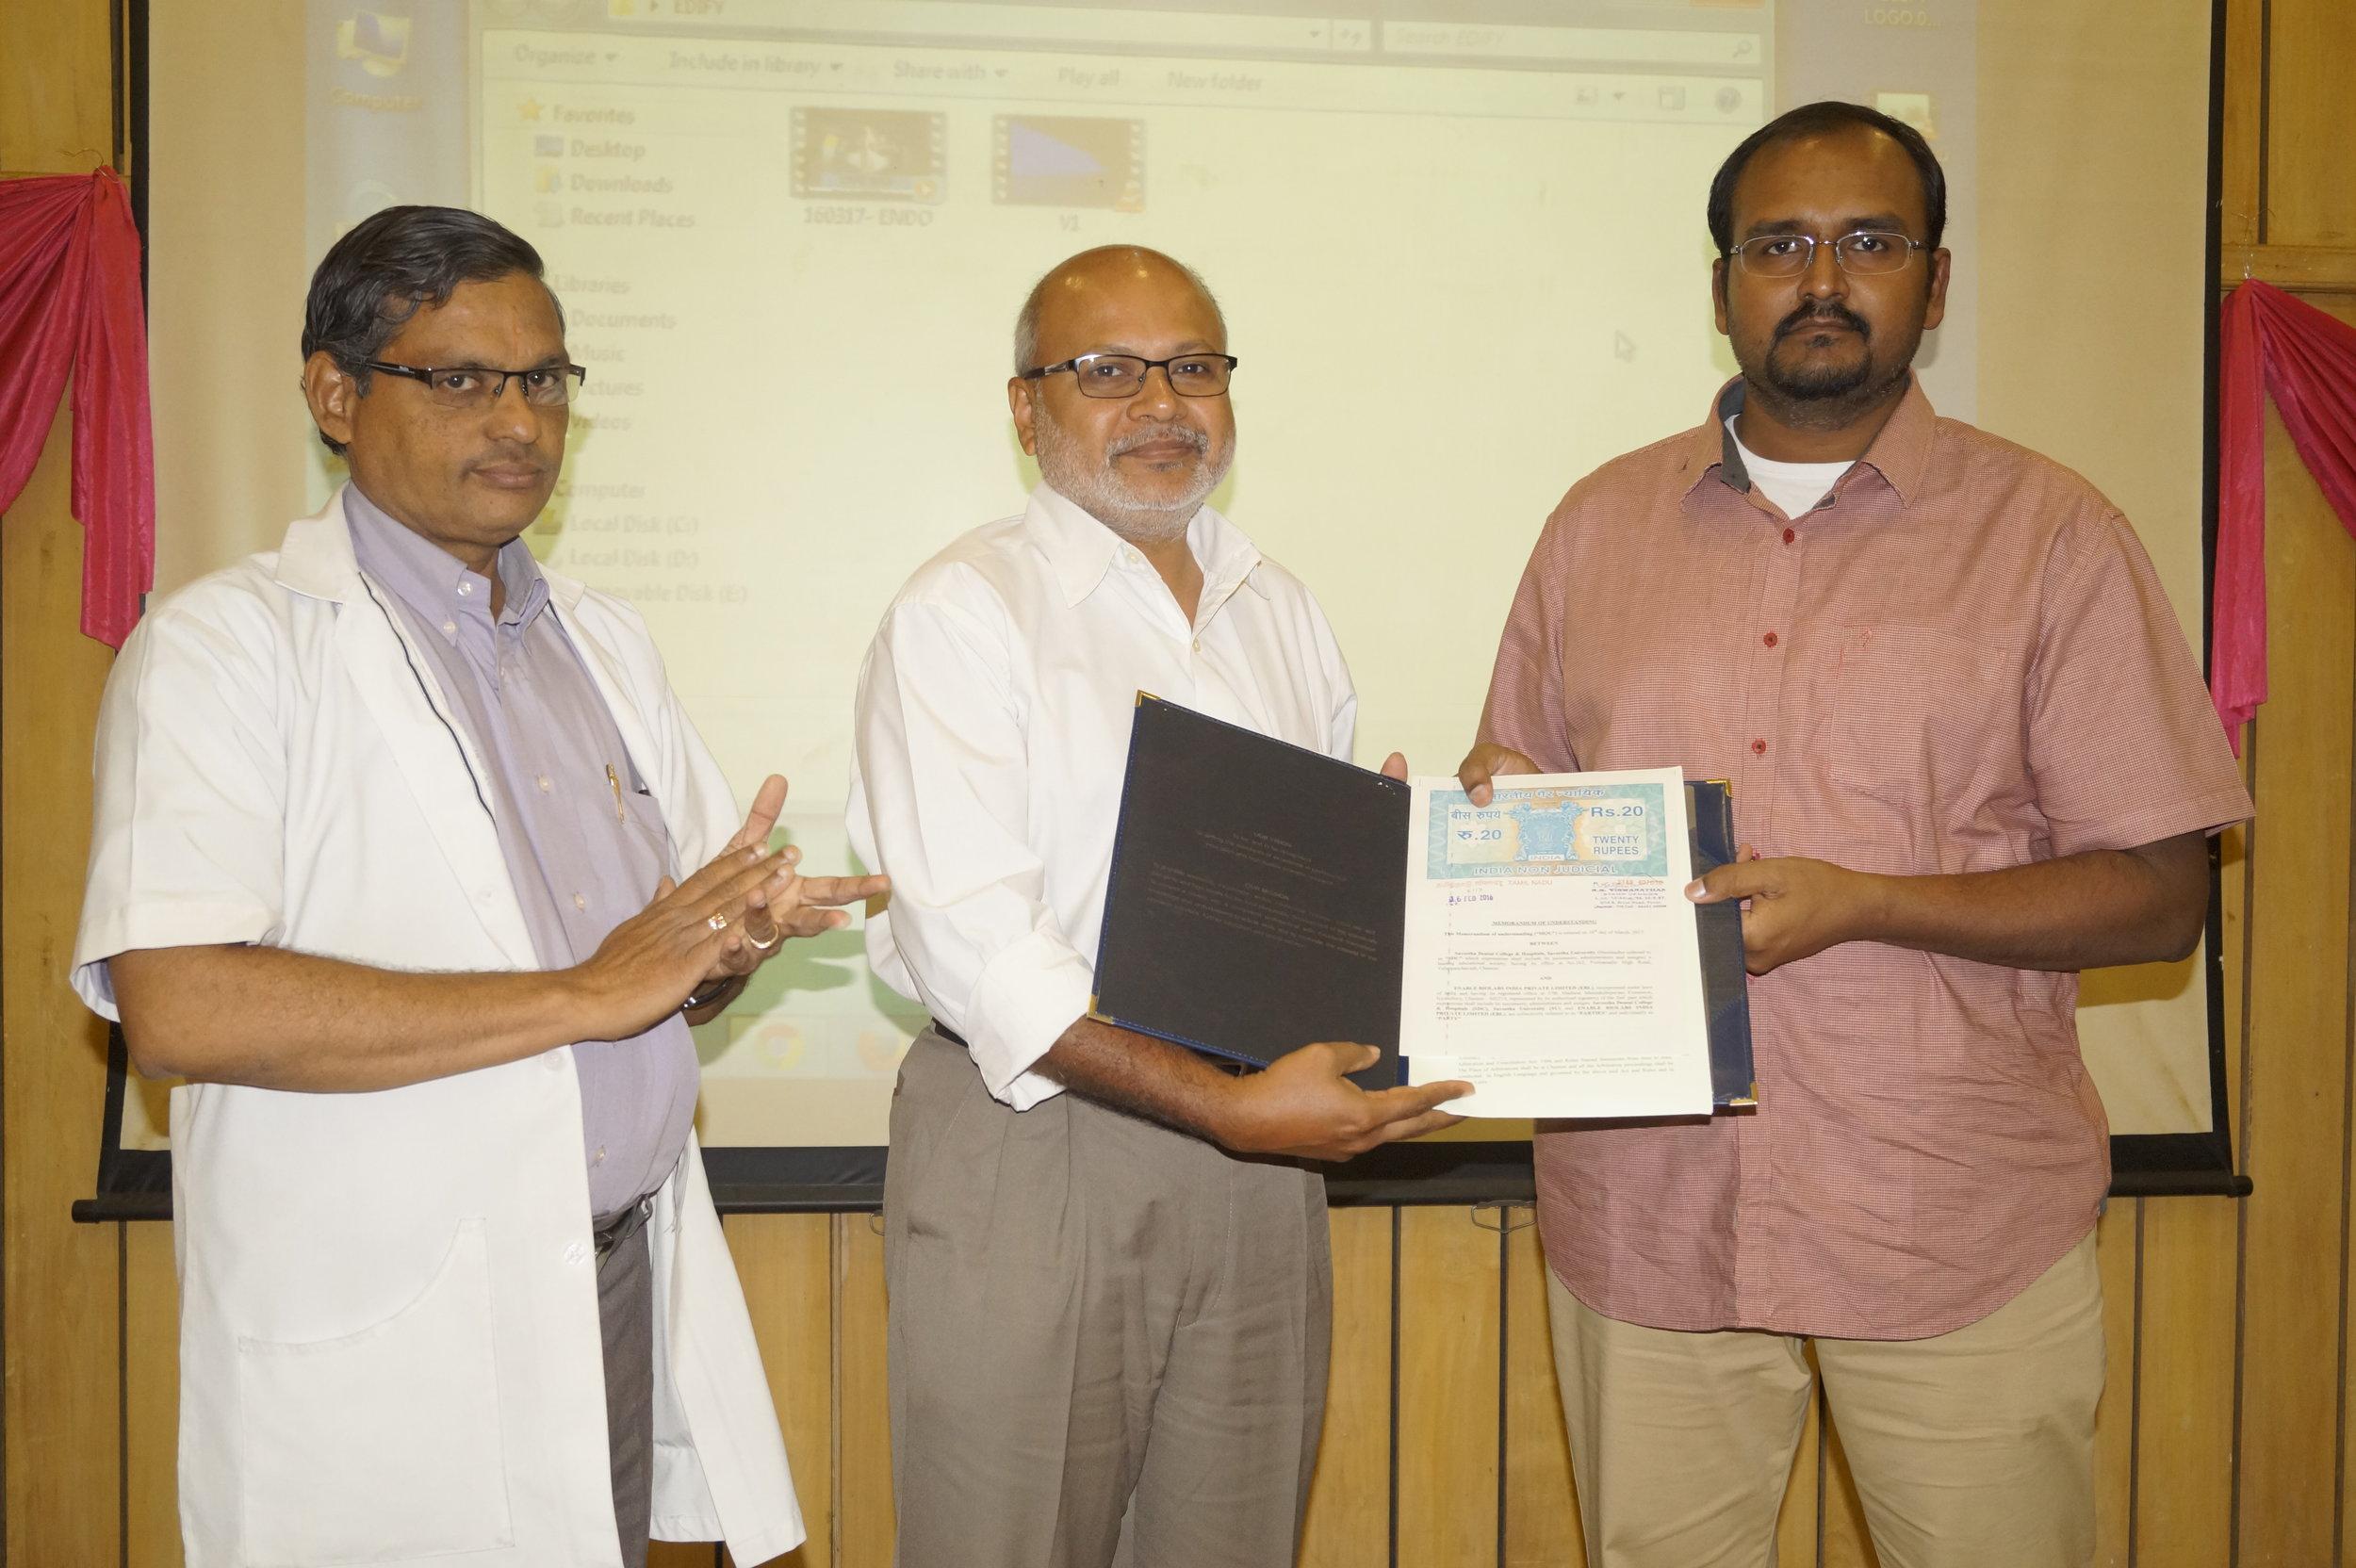 Dr.Arvind Ramanathan & Dr. Deepak Nallasamy, With the MOU